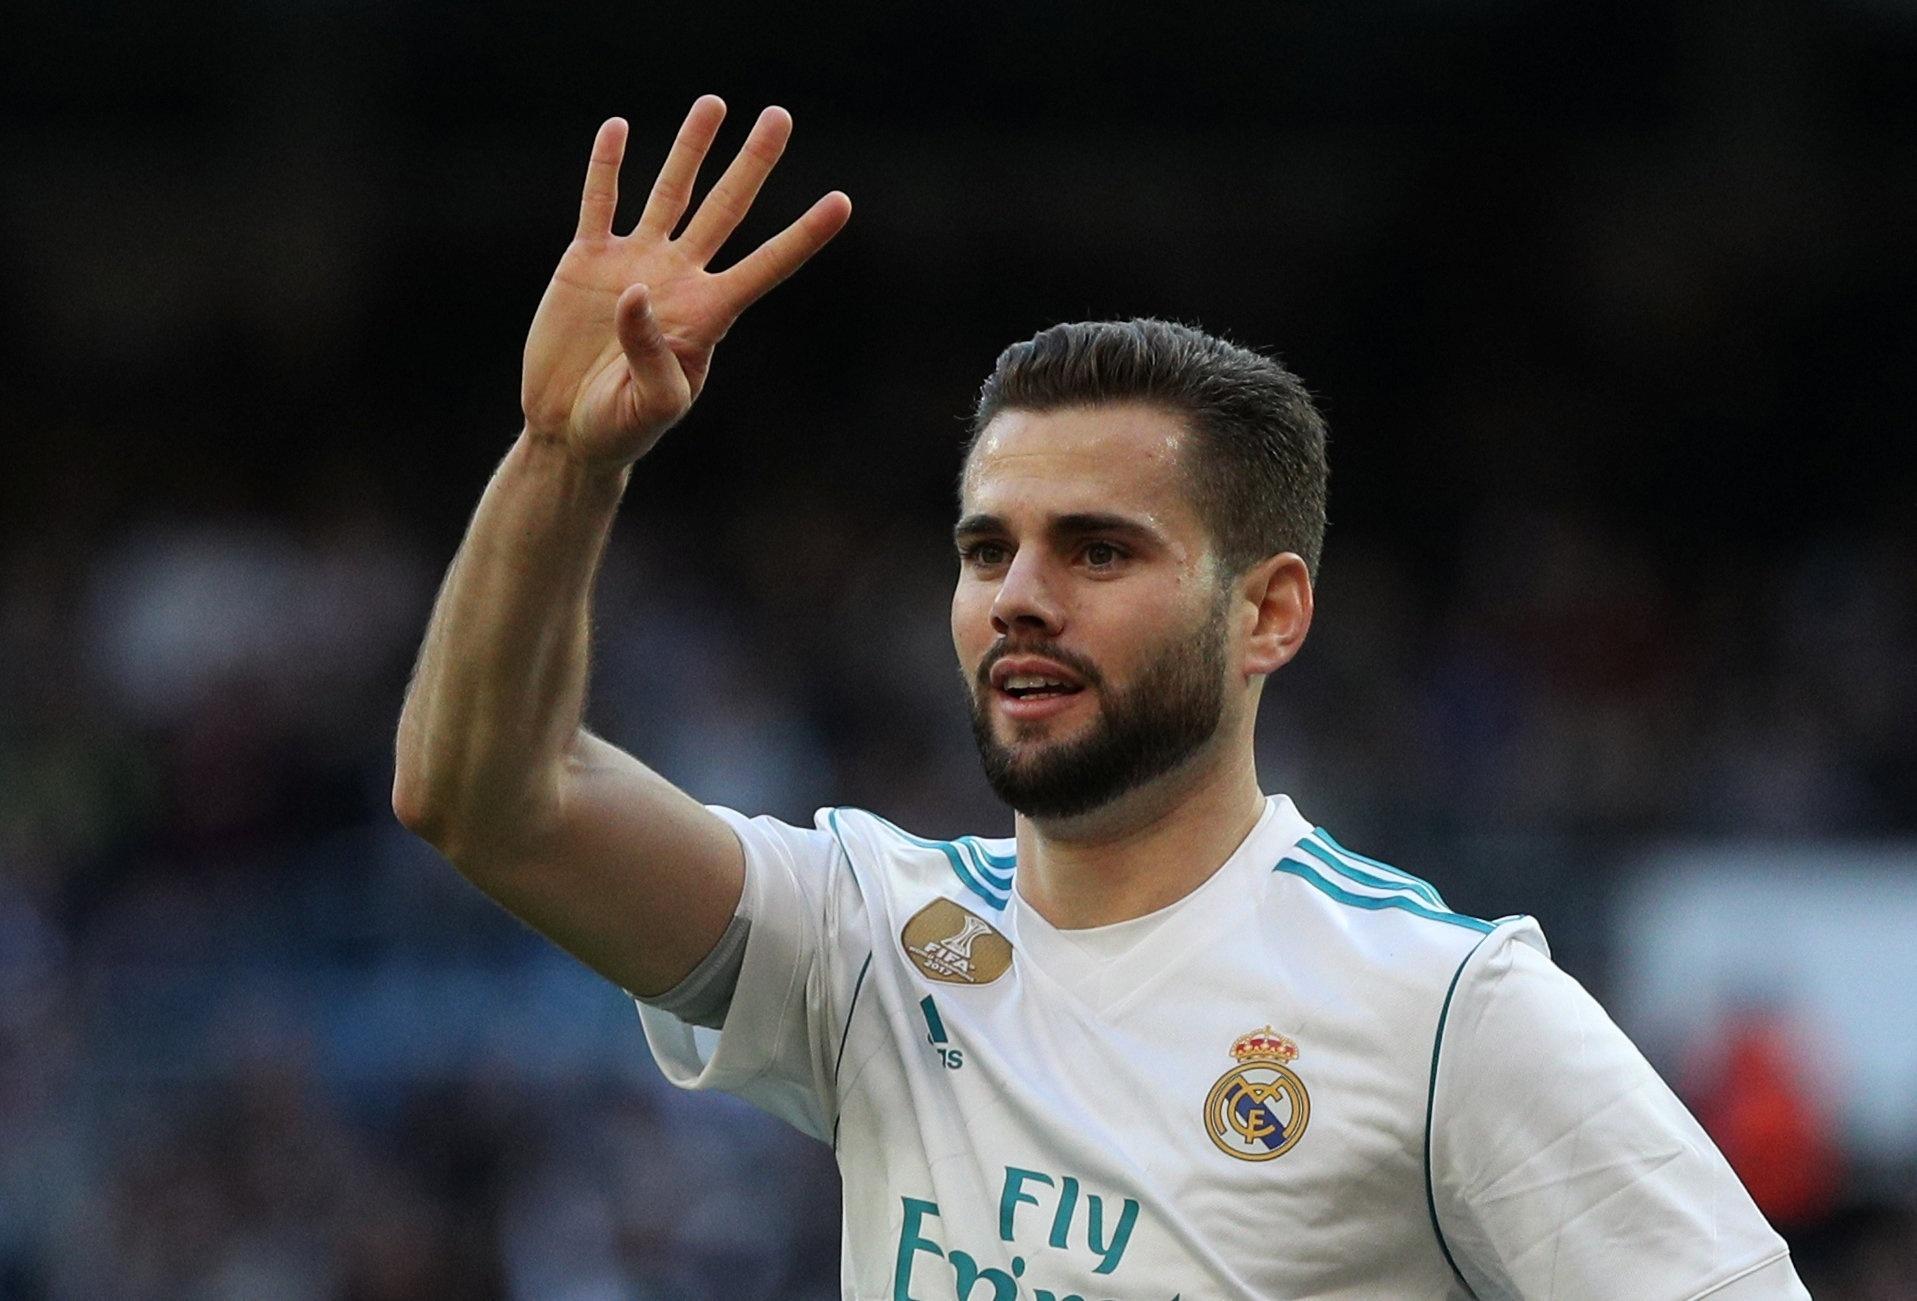 Nacho celebra após marcar para o Real Madrid contra o La Coruña